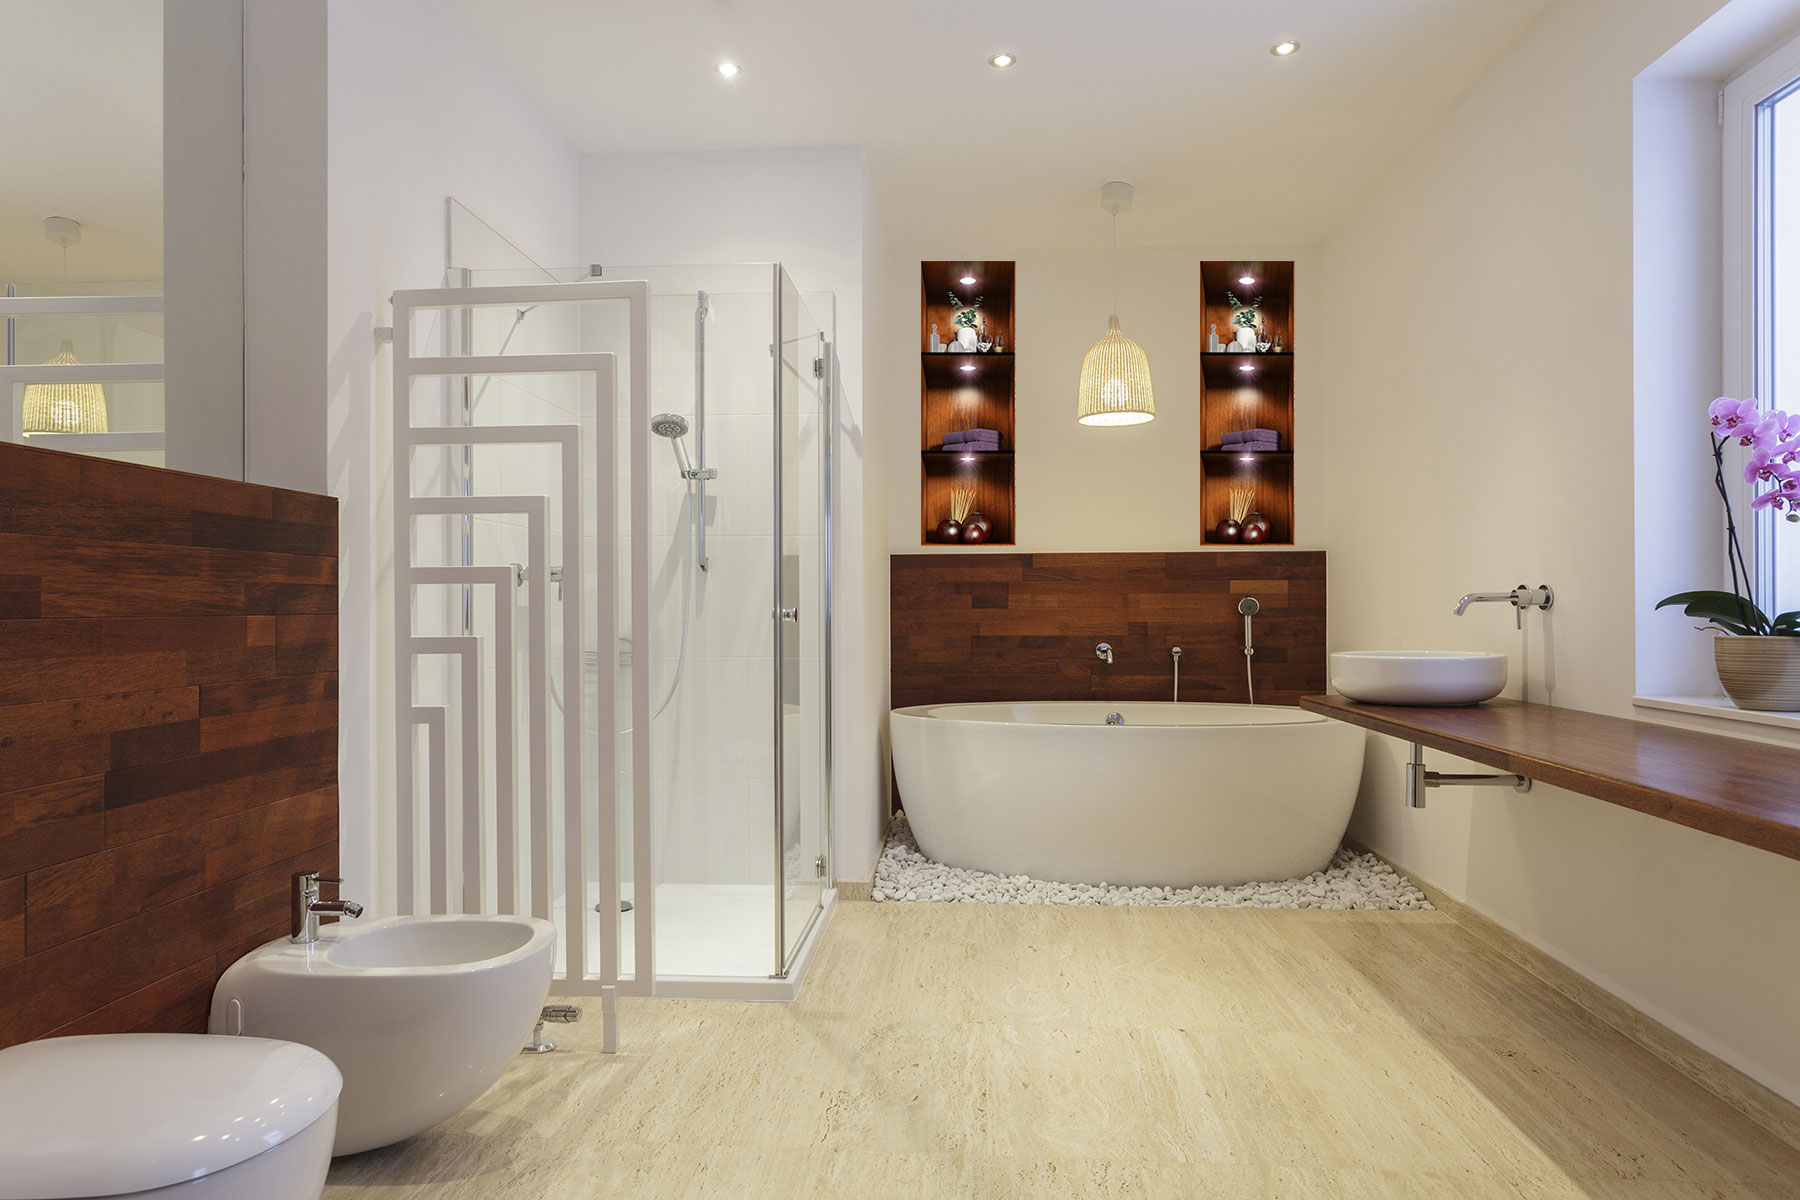 Sticker effet 3d salle de bain ambiance spa stickers art for Salle bain 3d